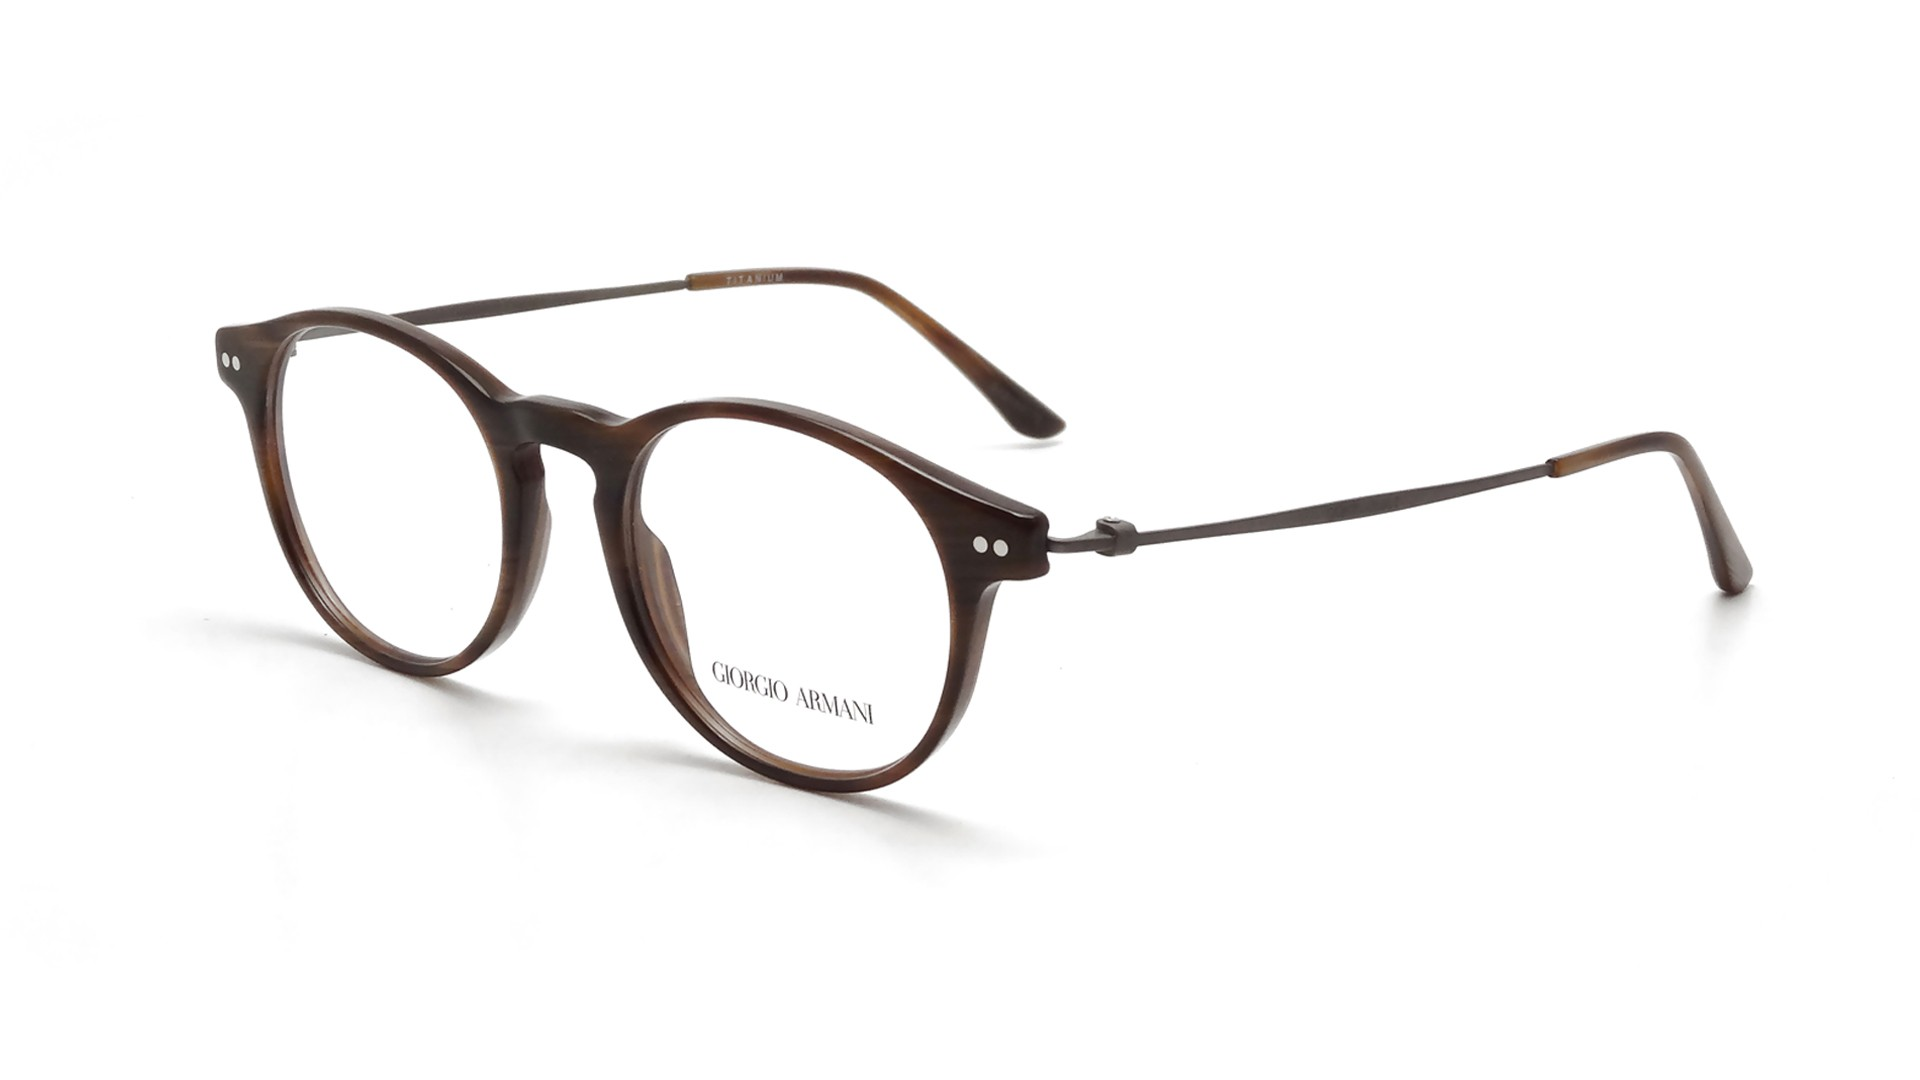 giorgio armani frames of brown ar7010 5023 49 18